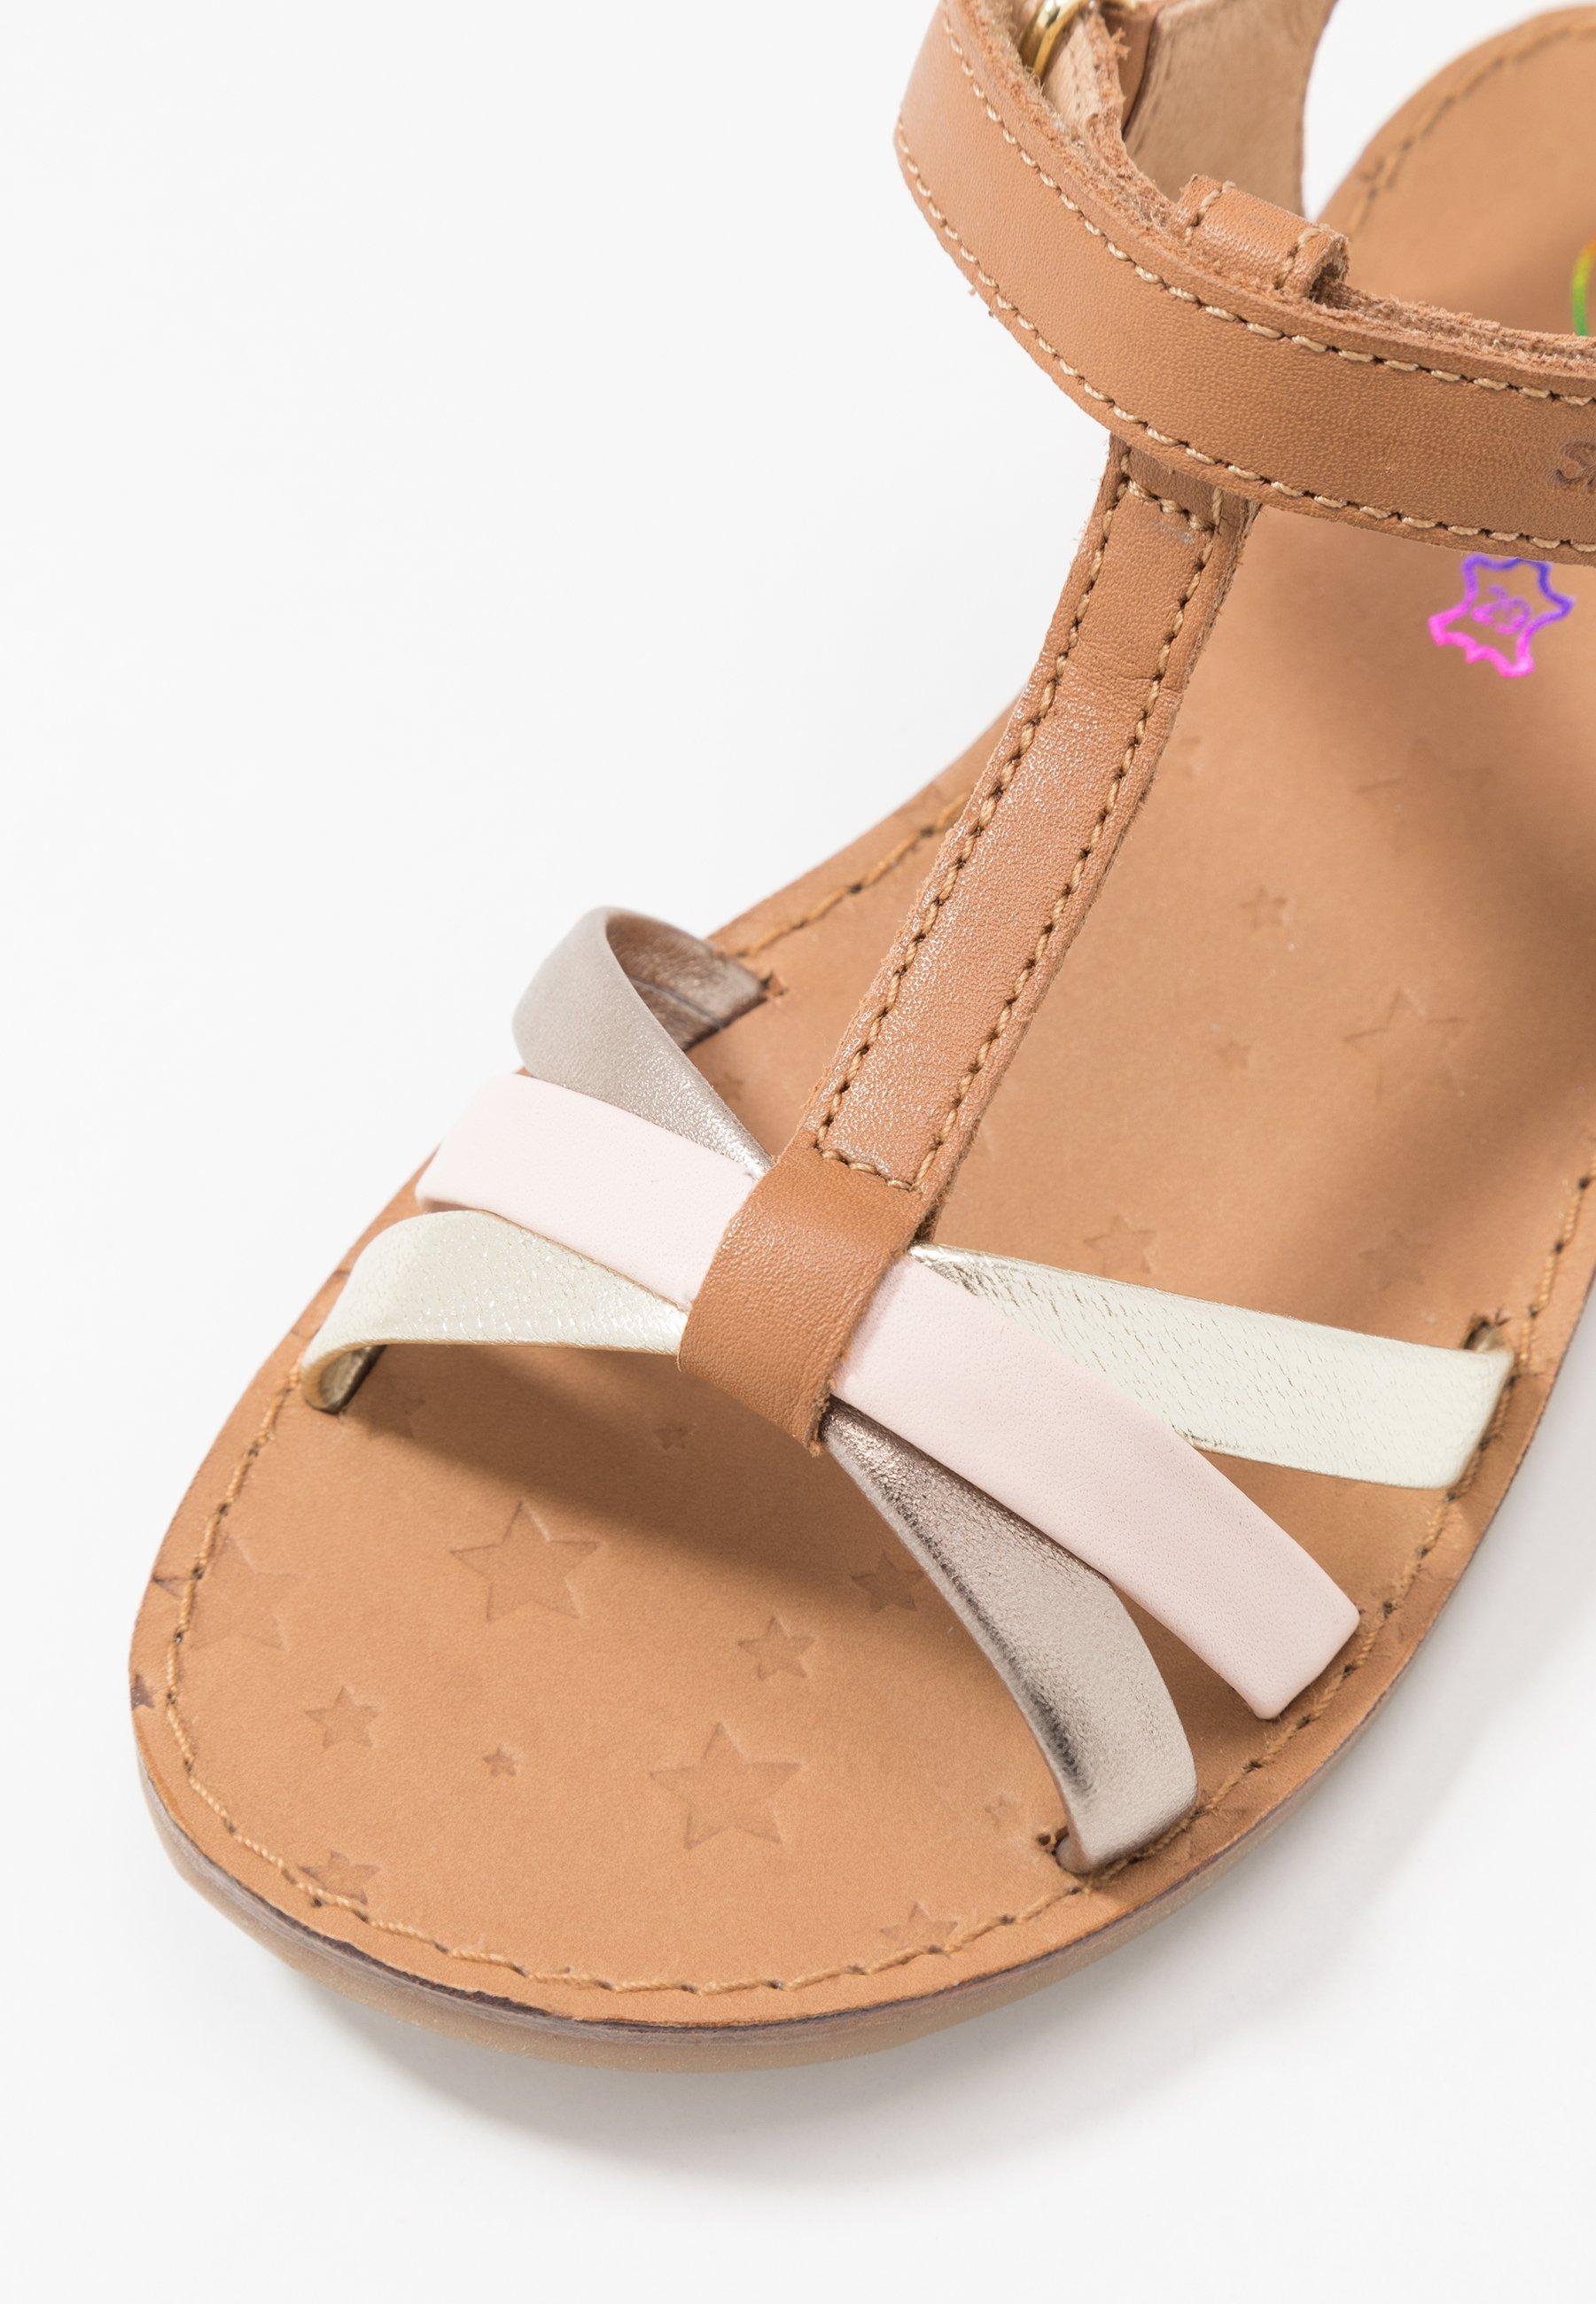 Shoo Pom HAPPY SALOME - Sandały - camel/platine/pink